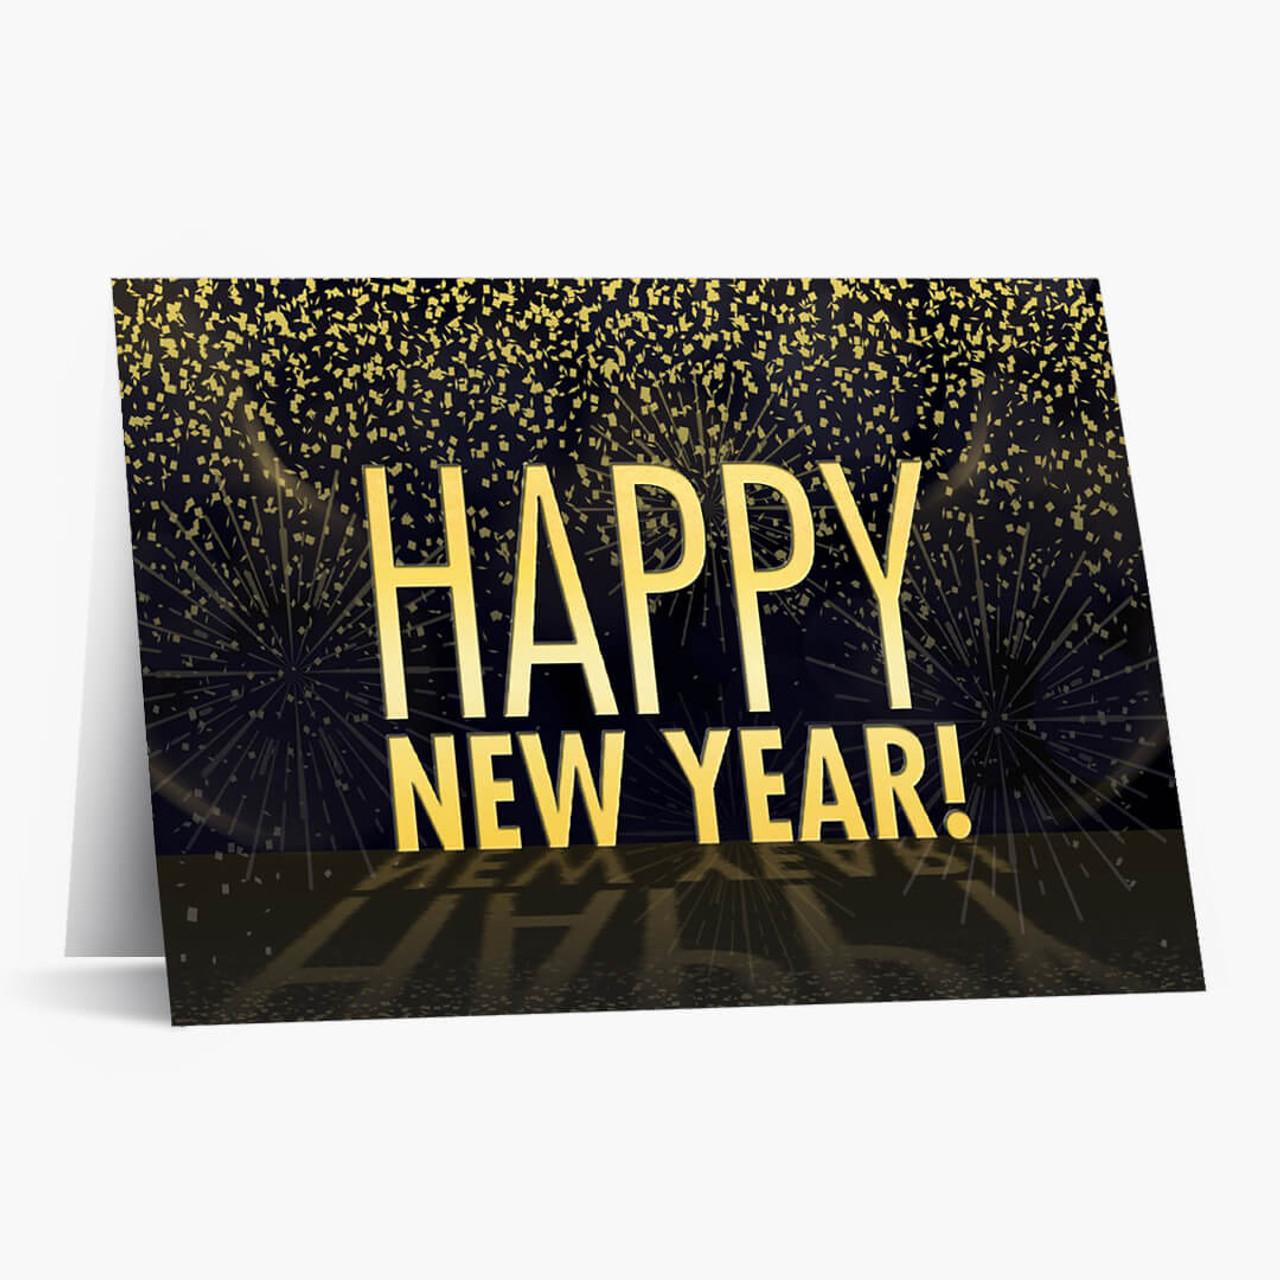 Big Happy New Year Christmas Card